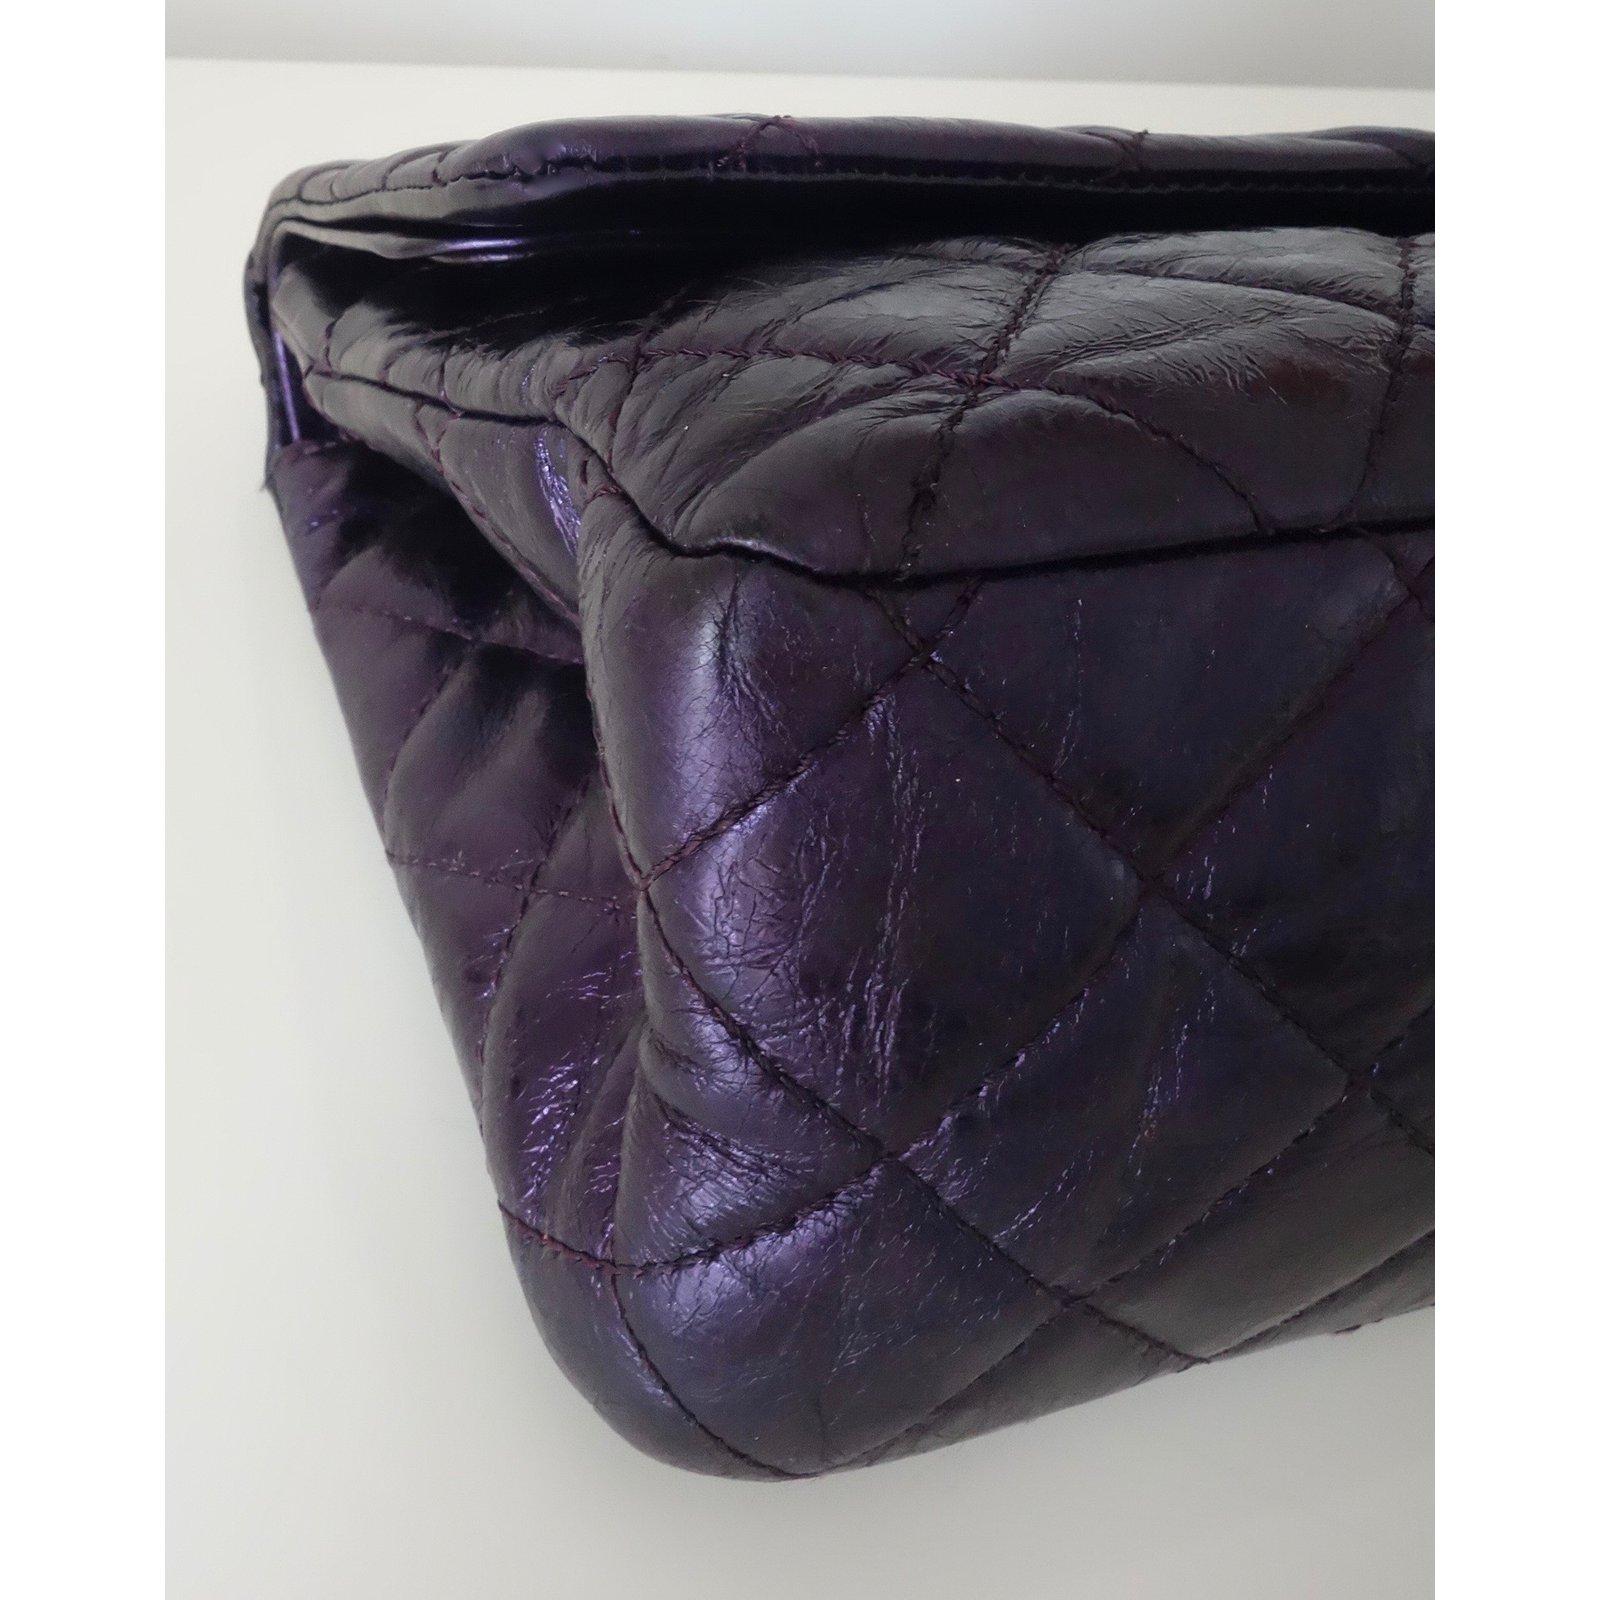 1510abd7ca63f7 Facebook · Pin This. Chanel 2.55 maxi Handbags Leather Purple ...